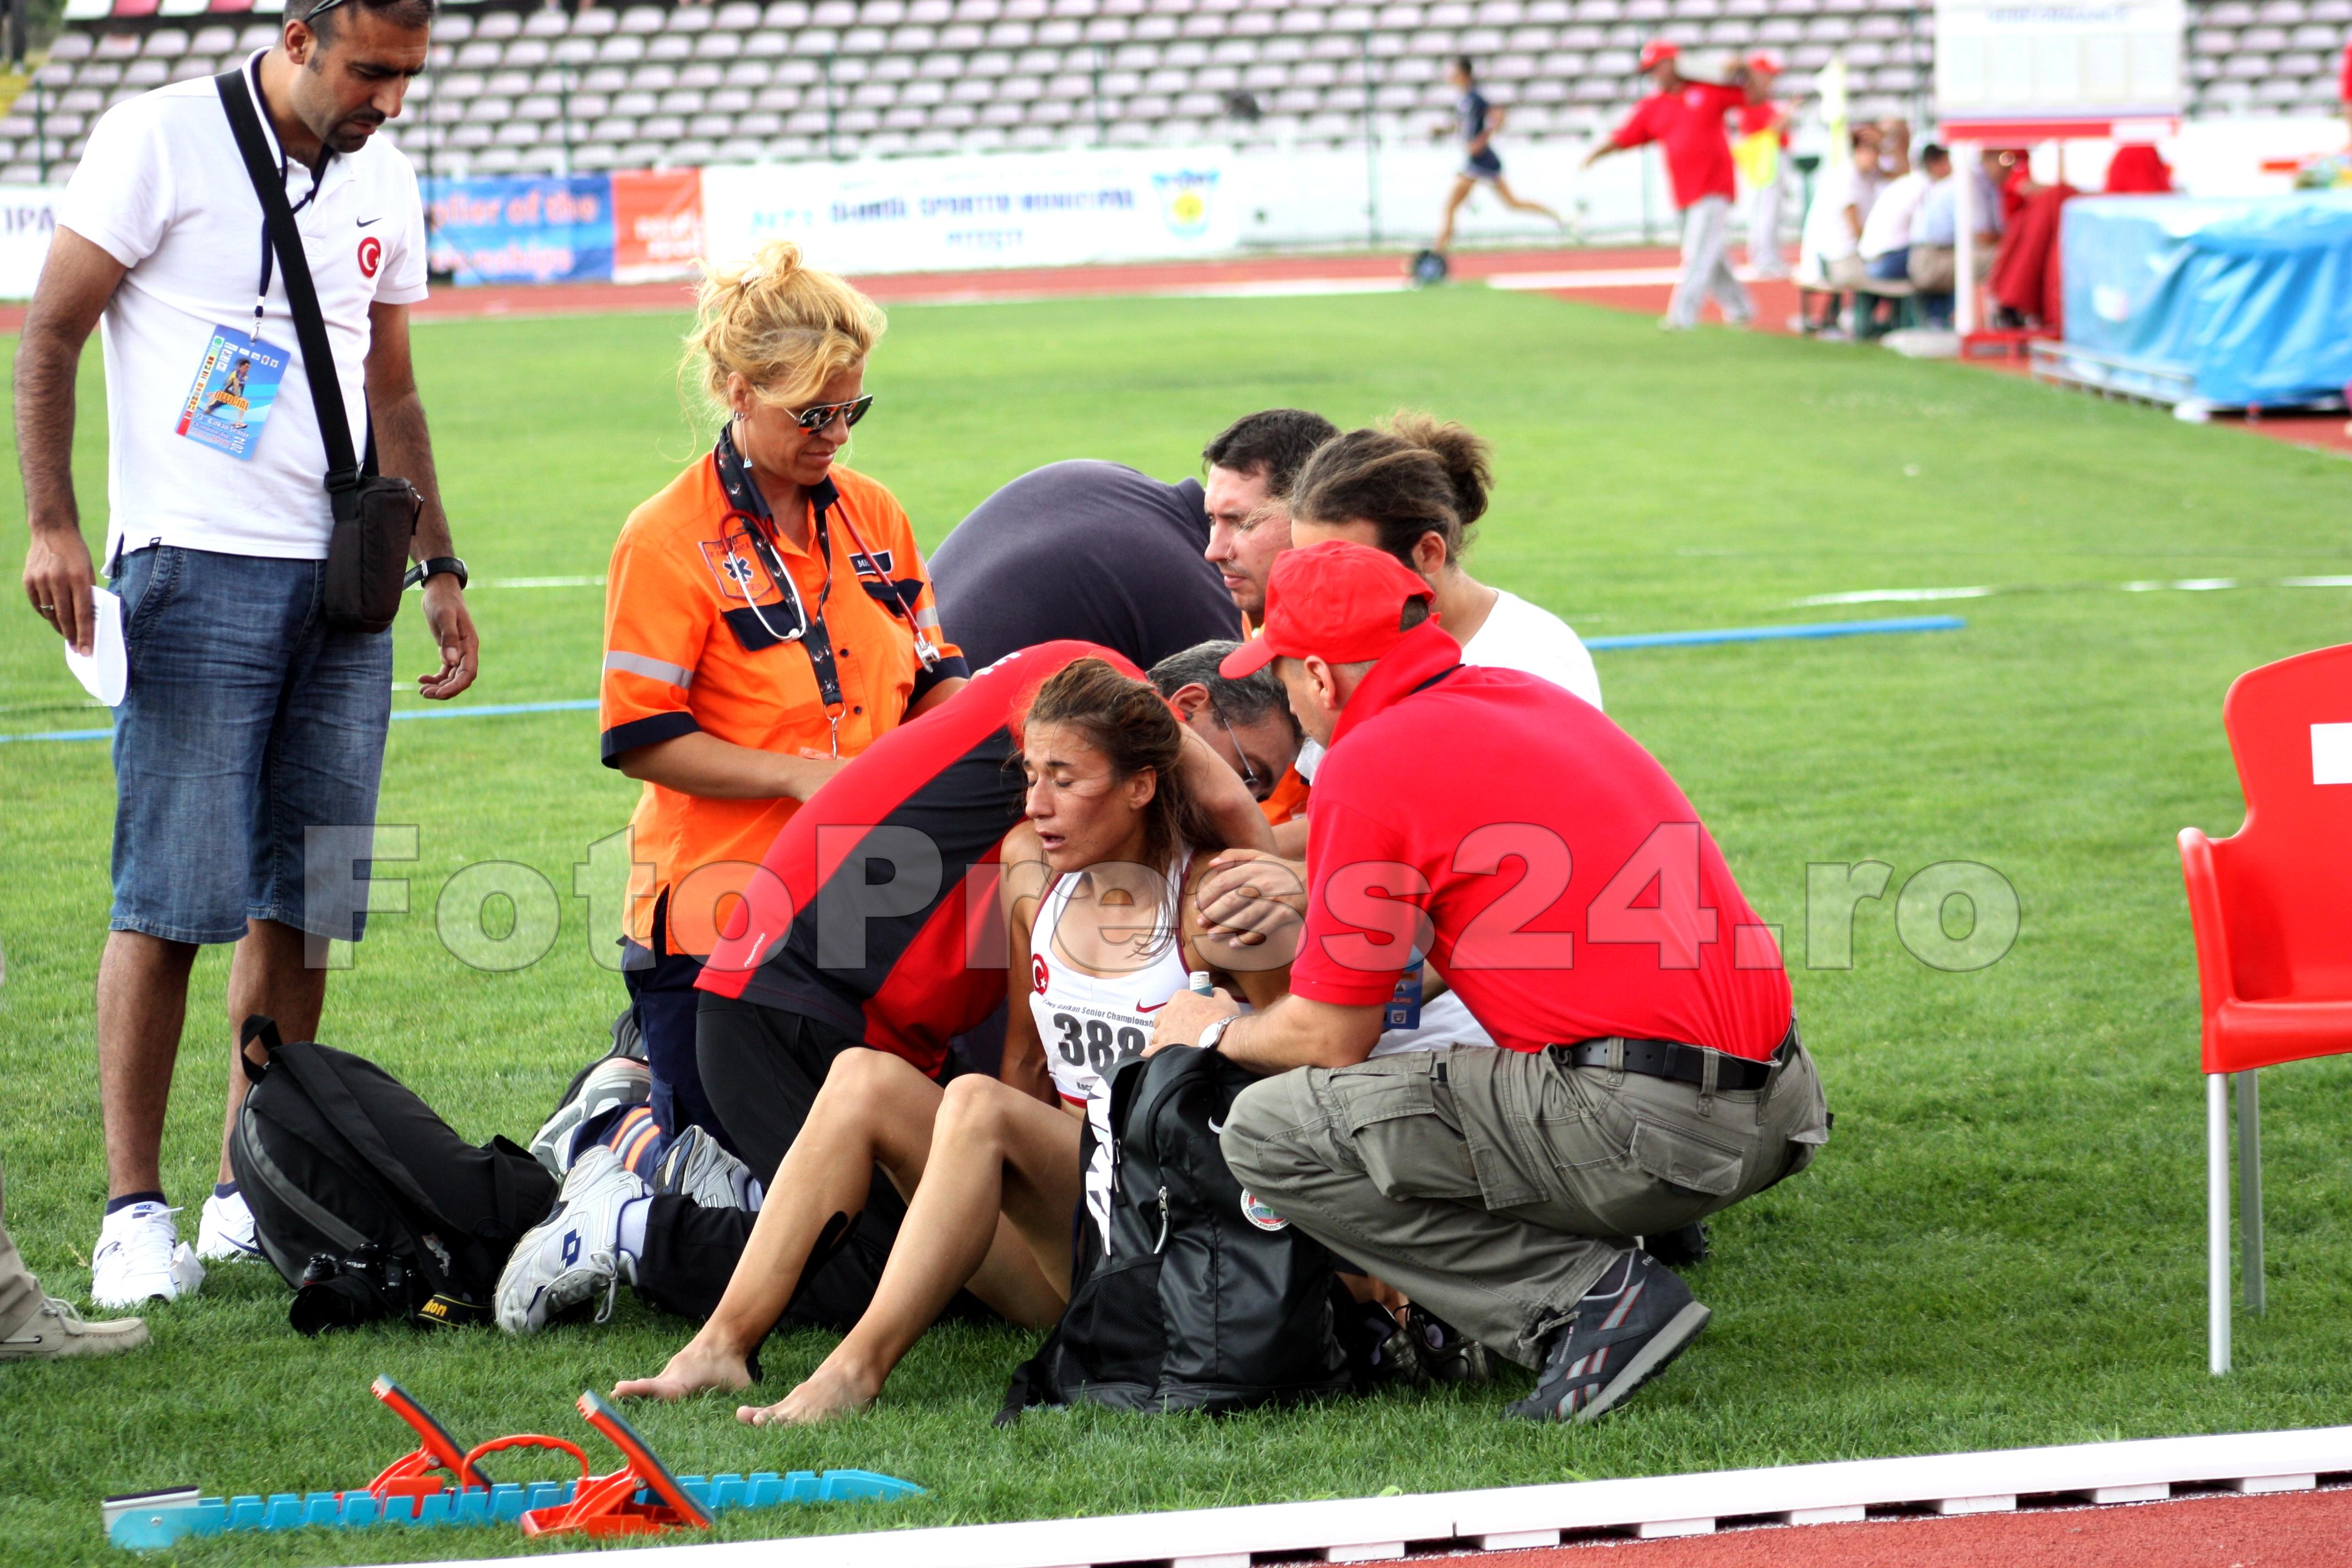 BC-atletism-FotoPress24.ro-Mihai Neacsu (5)